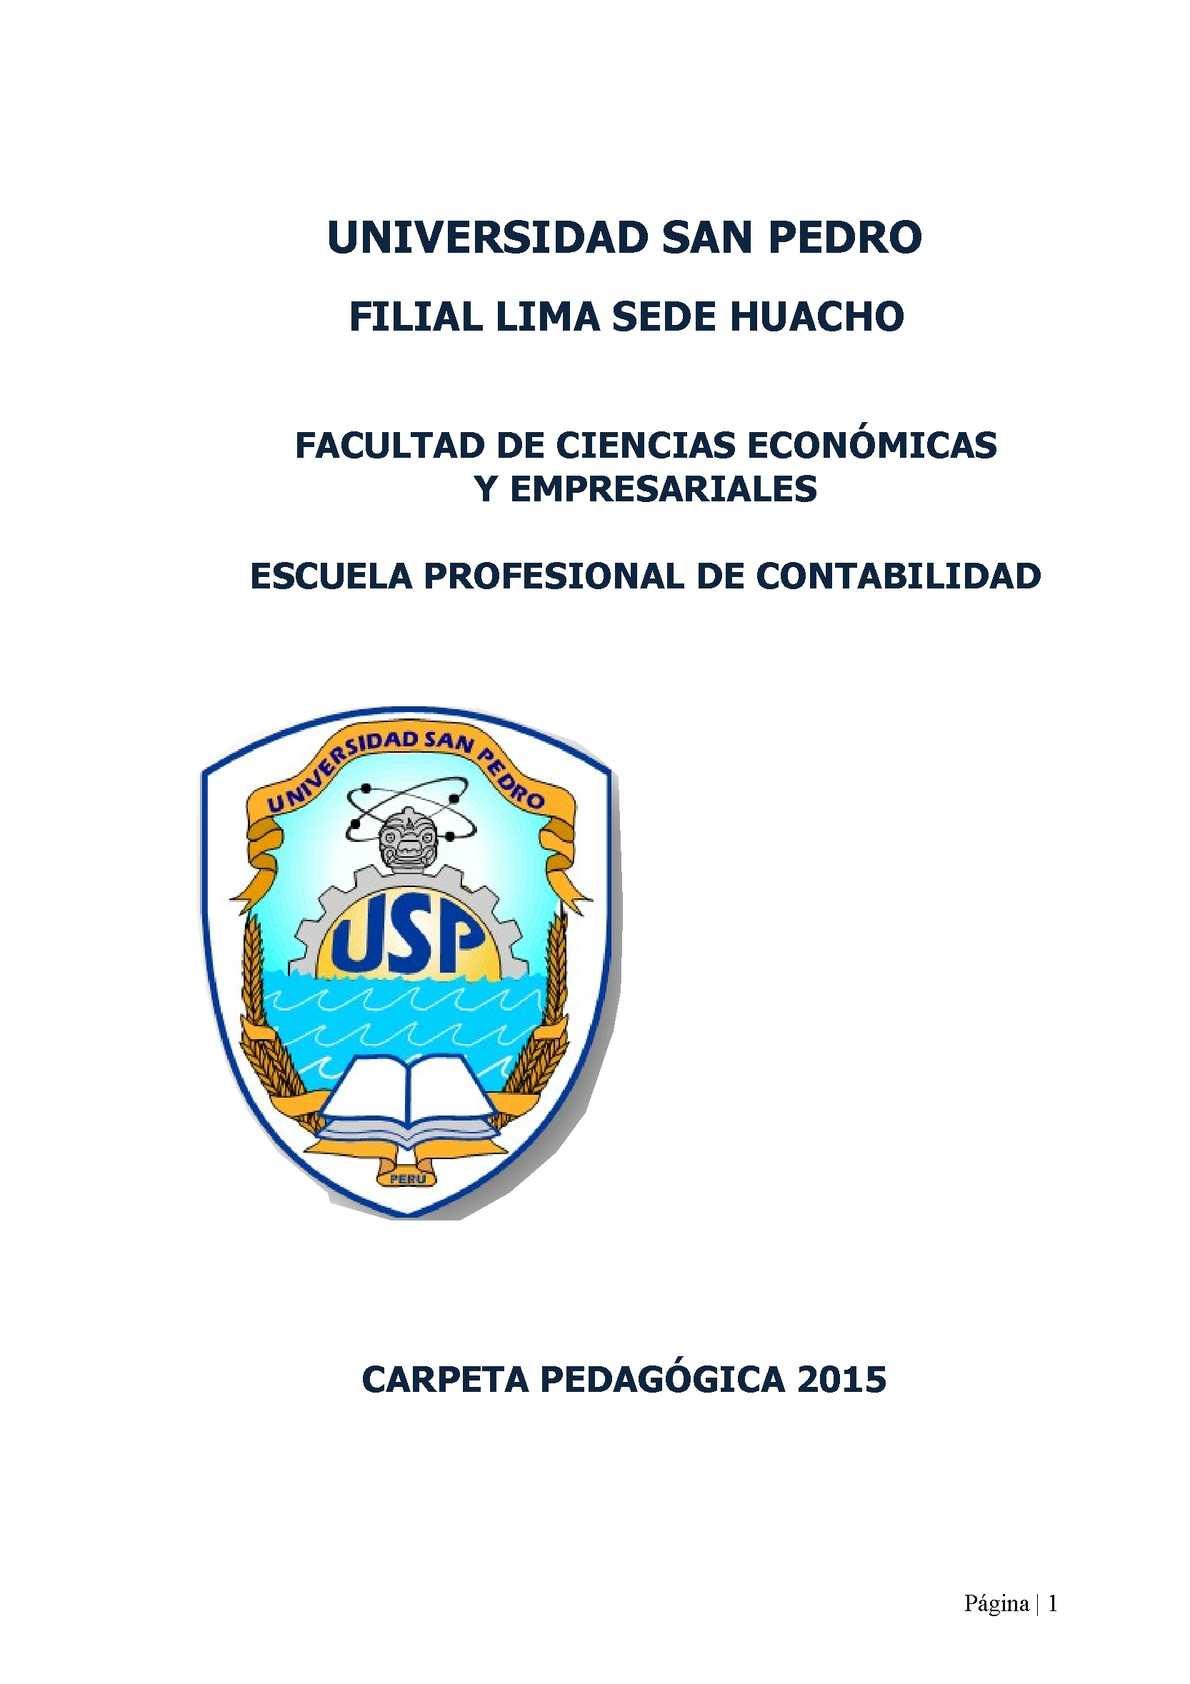 Calaméo - Carpeta Pedagógica 2015